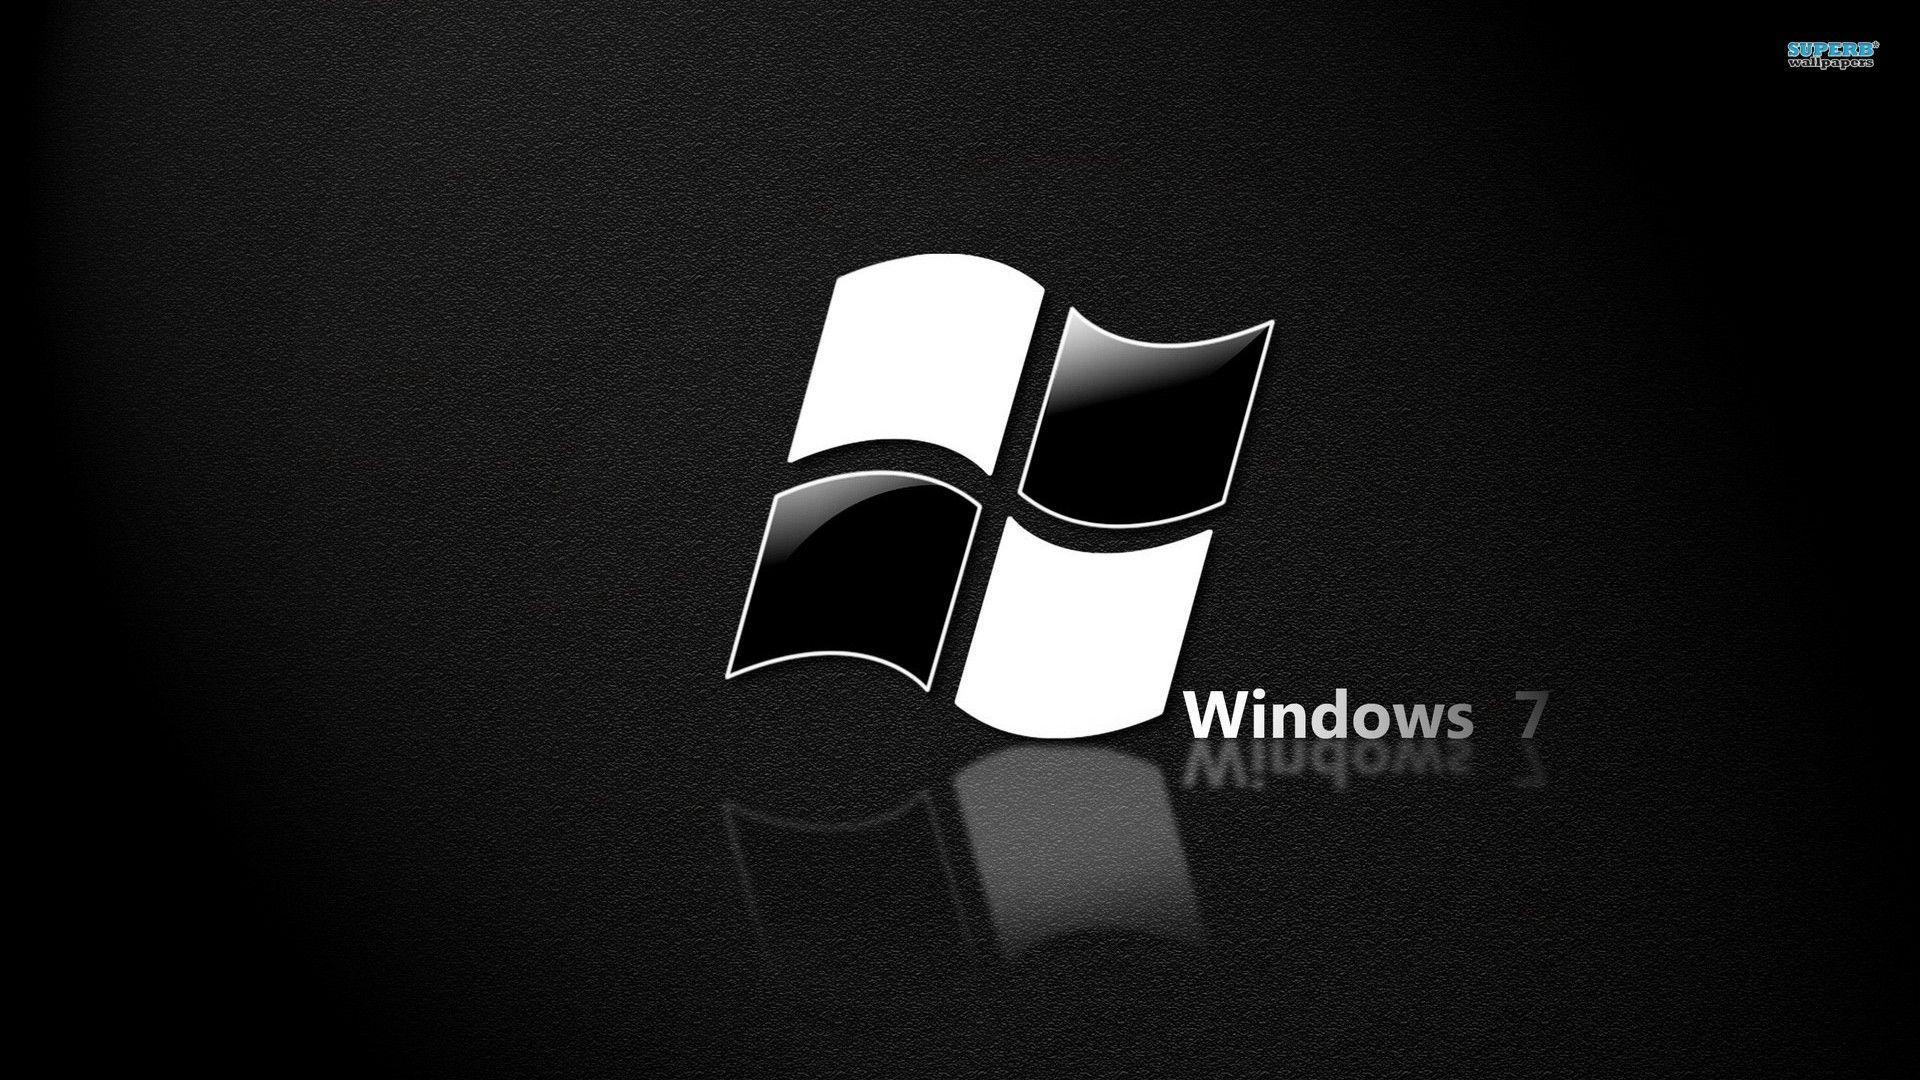 Windows 7 Black Wallpapers Top Free Windows 7 Black Backgrounds